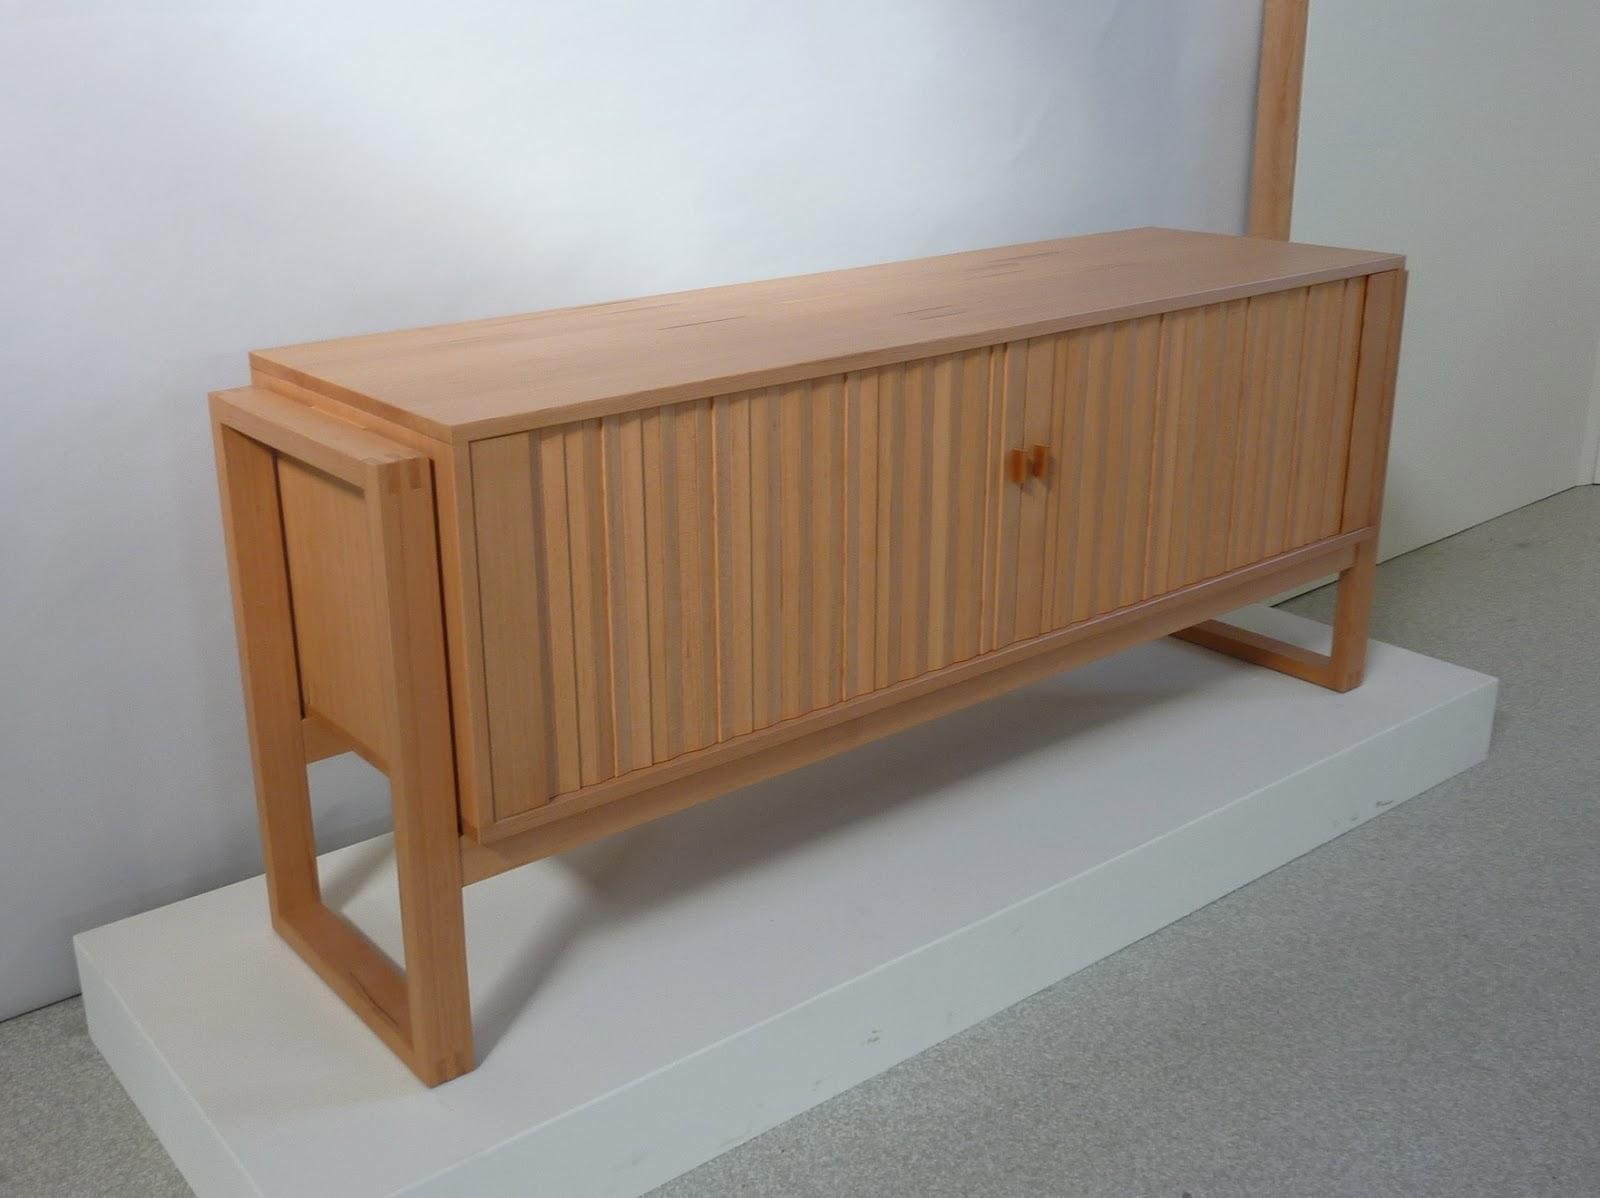 Killscrow, Darrick Rasmussen Furniture, Douglas Fir Sideboard